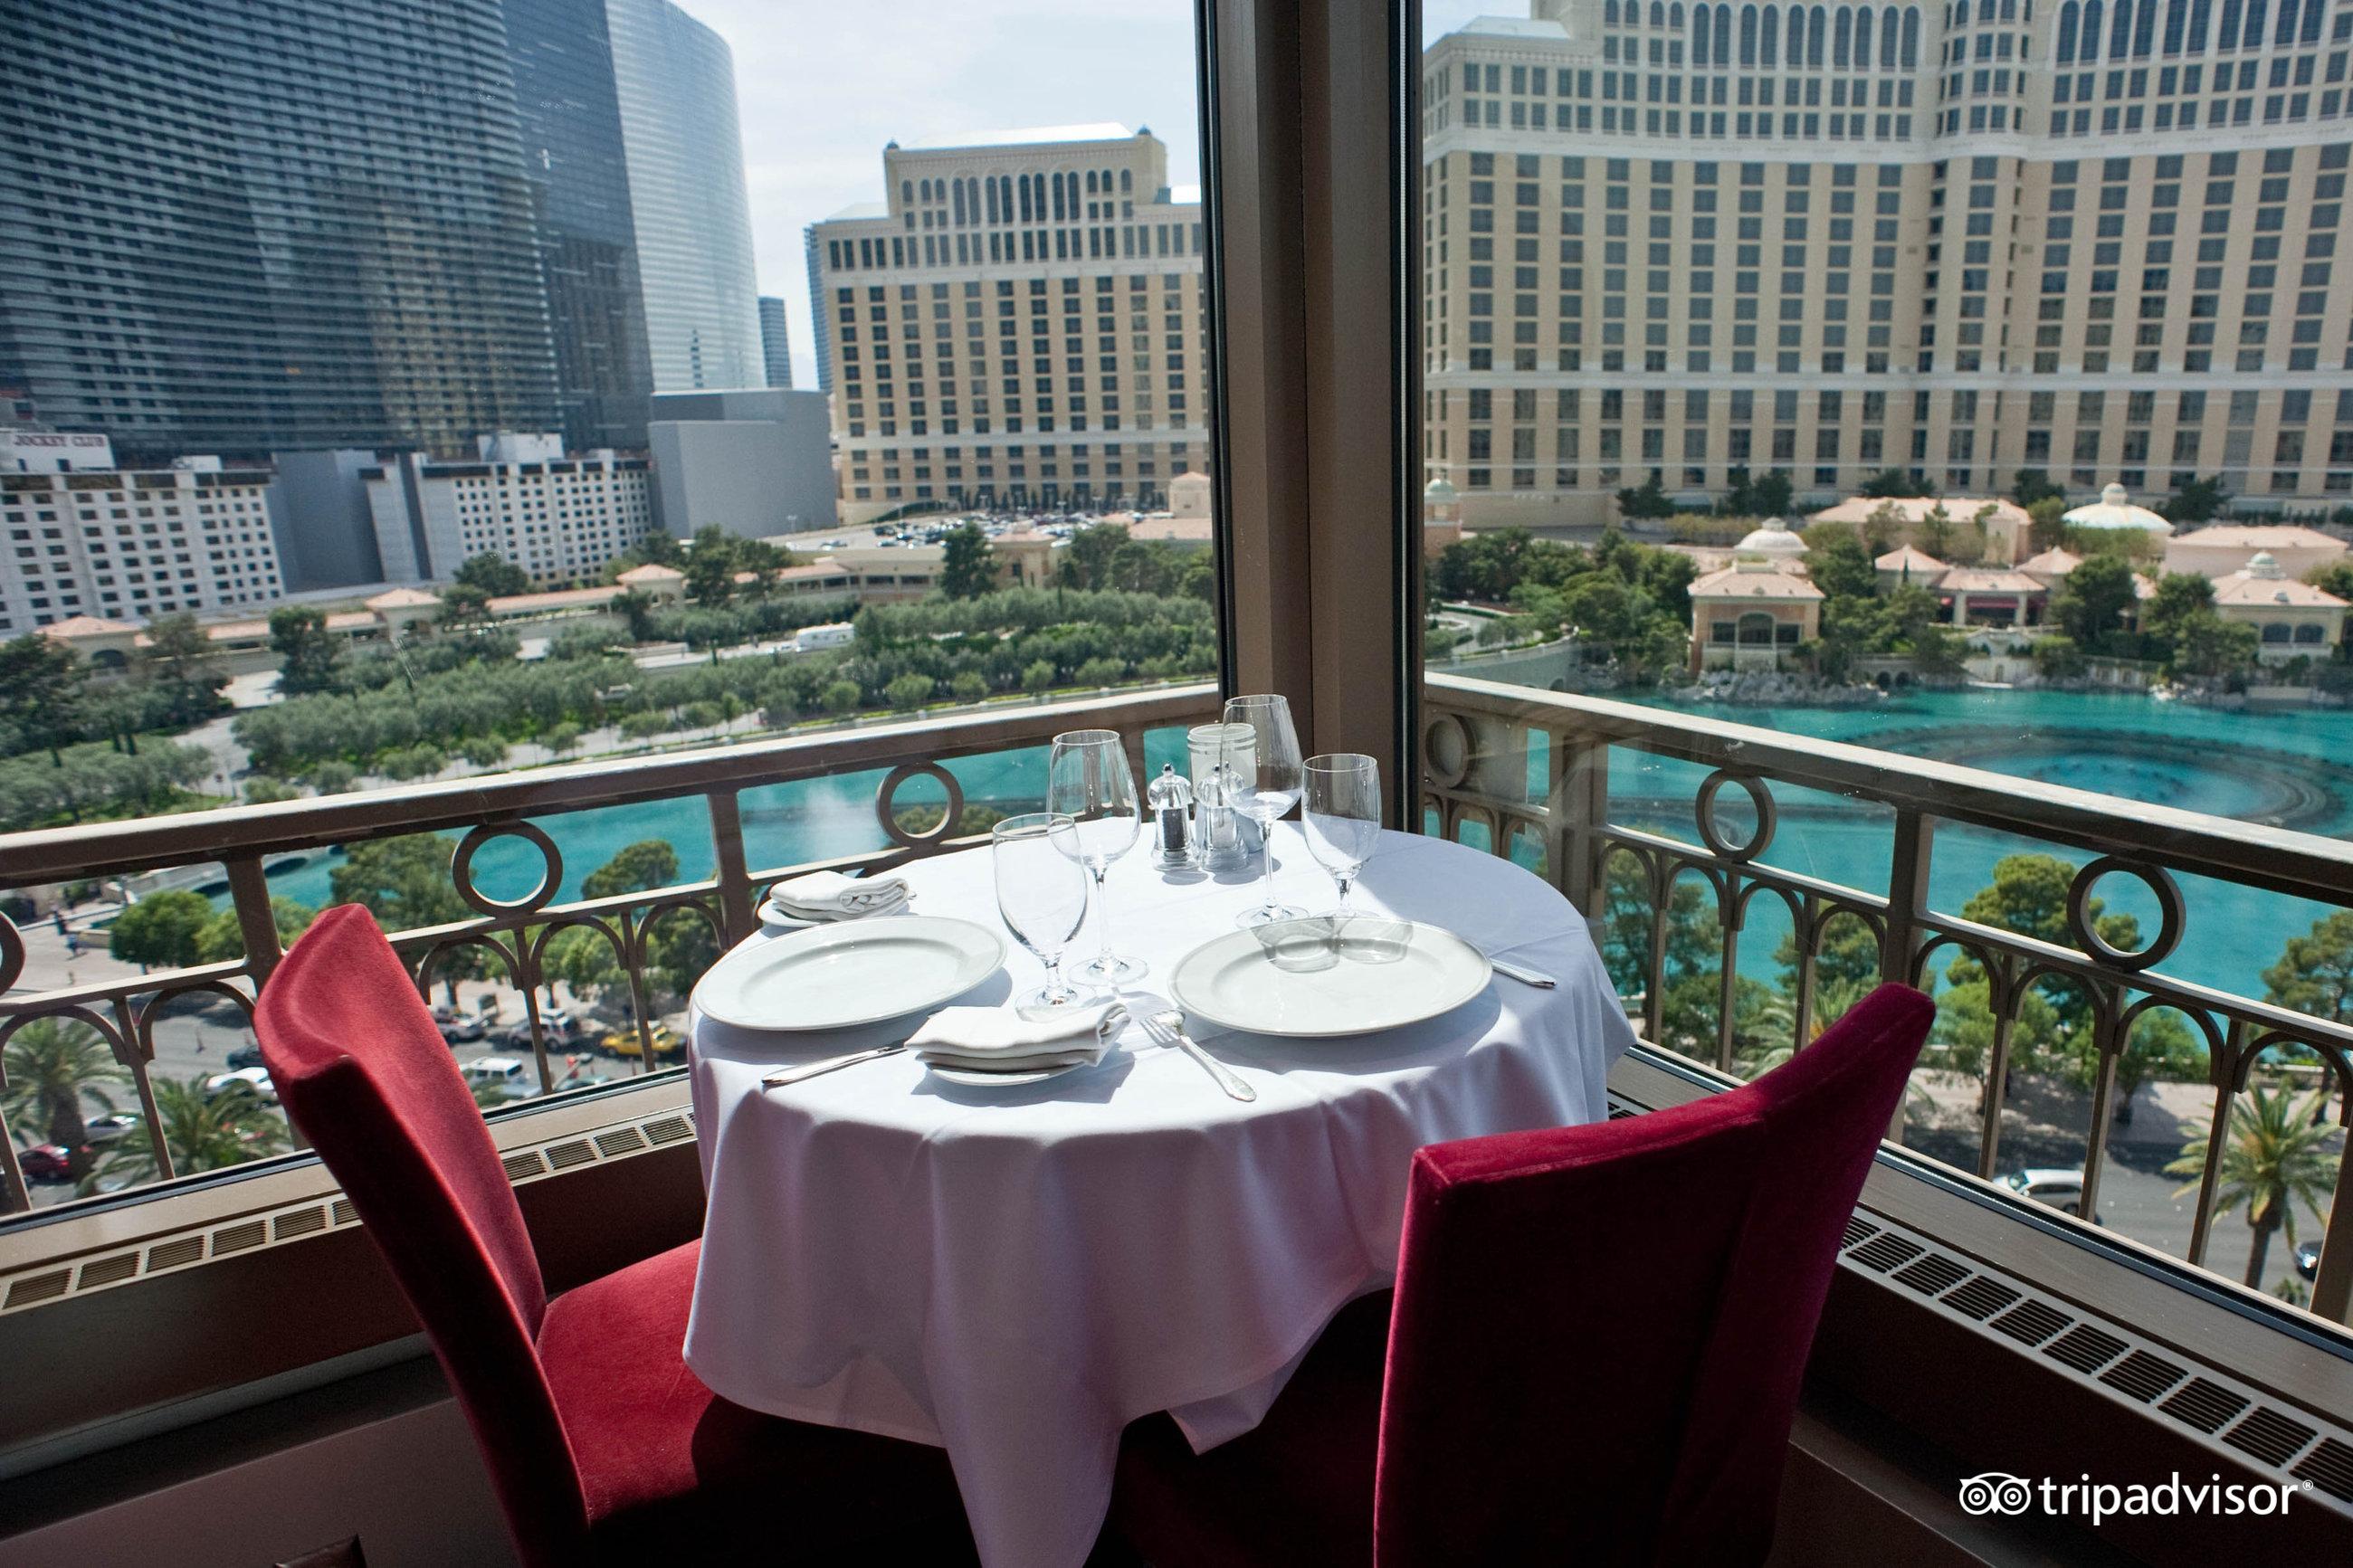 Paris Las Vegas NV 2017 Hotel Review Family Vacation Critic